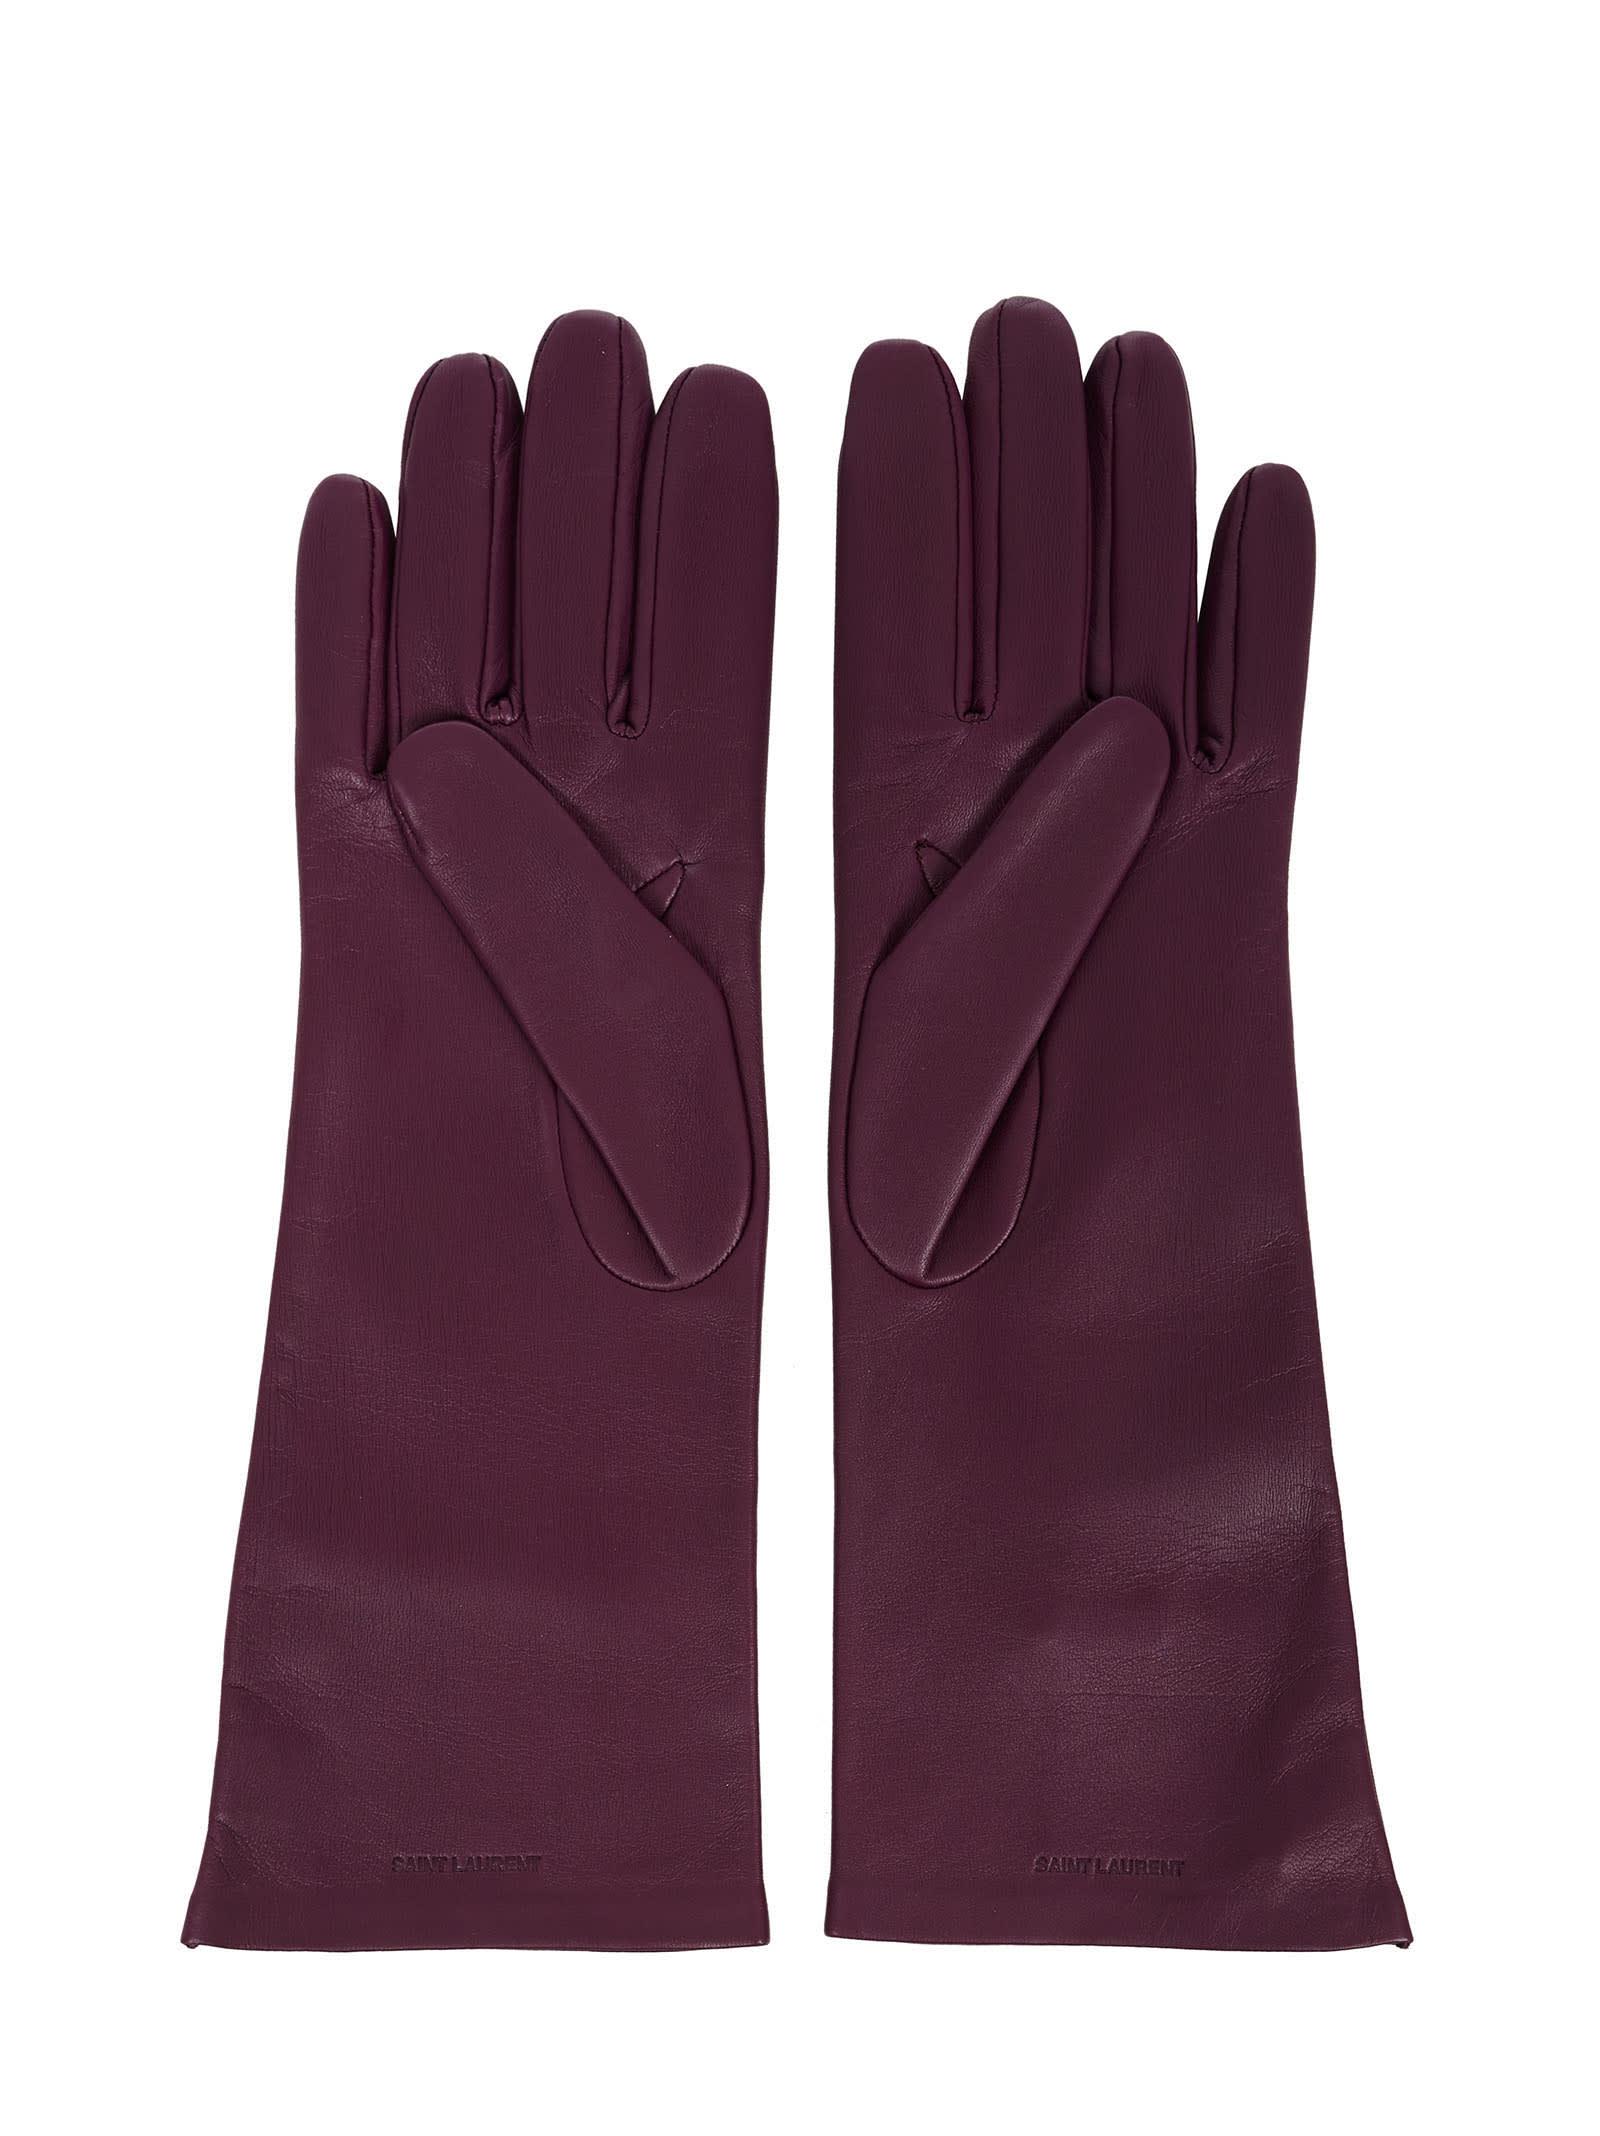 Saint Laurent Gloves In Purple